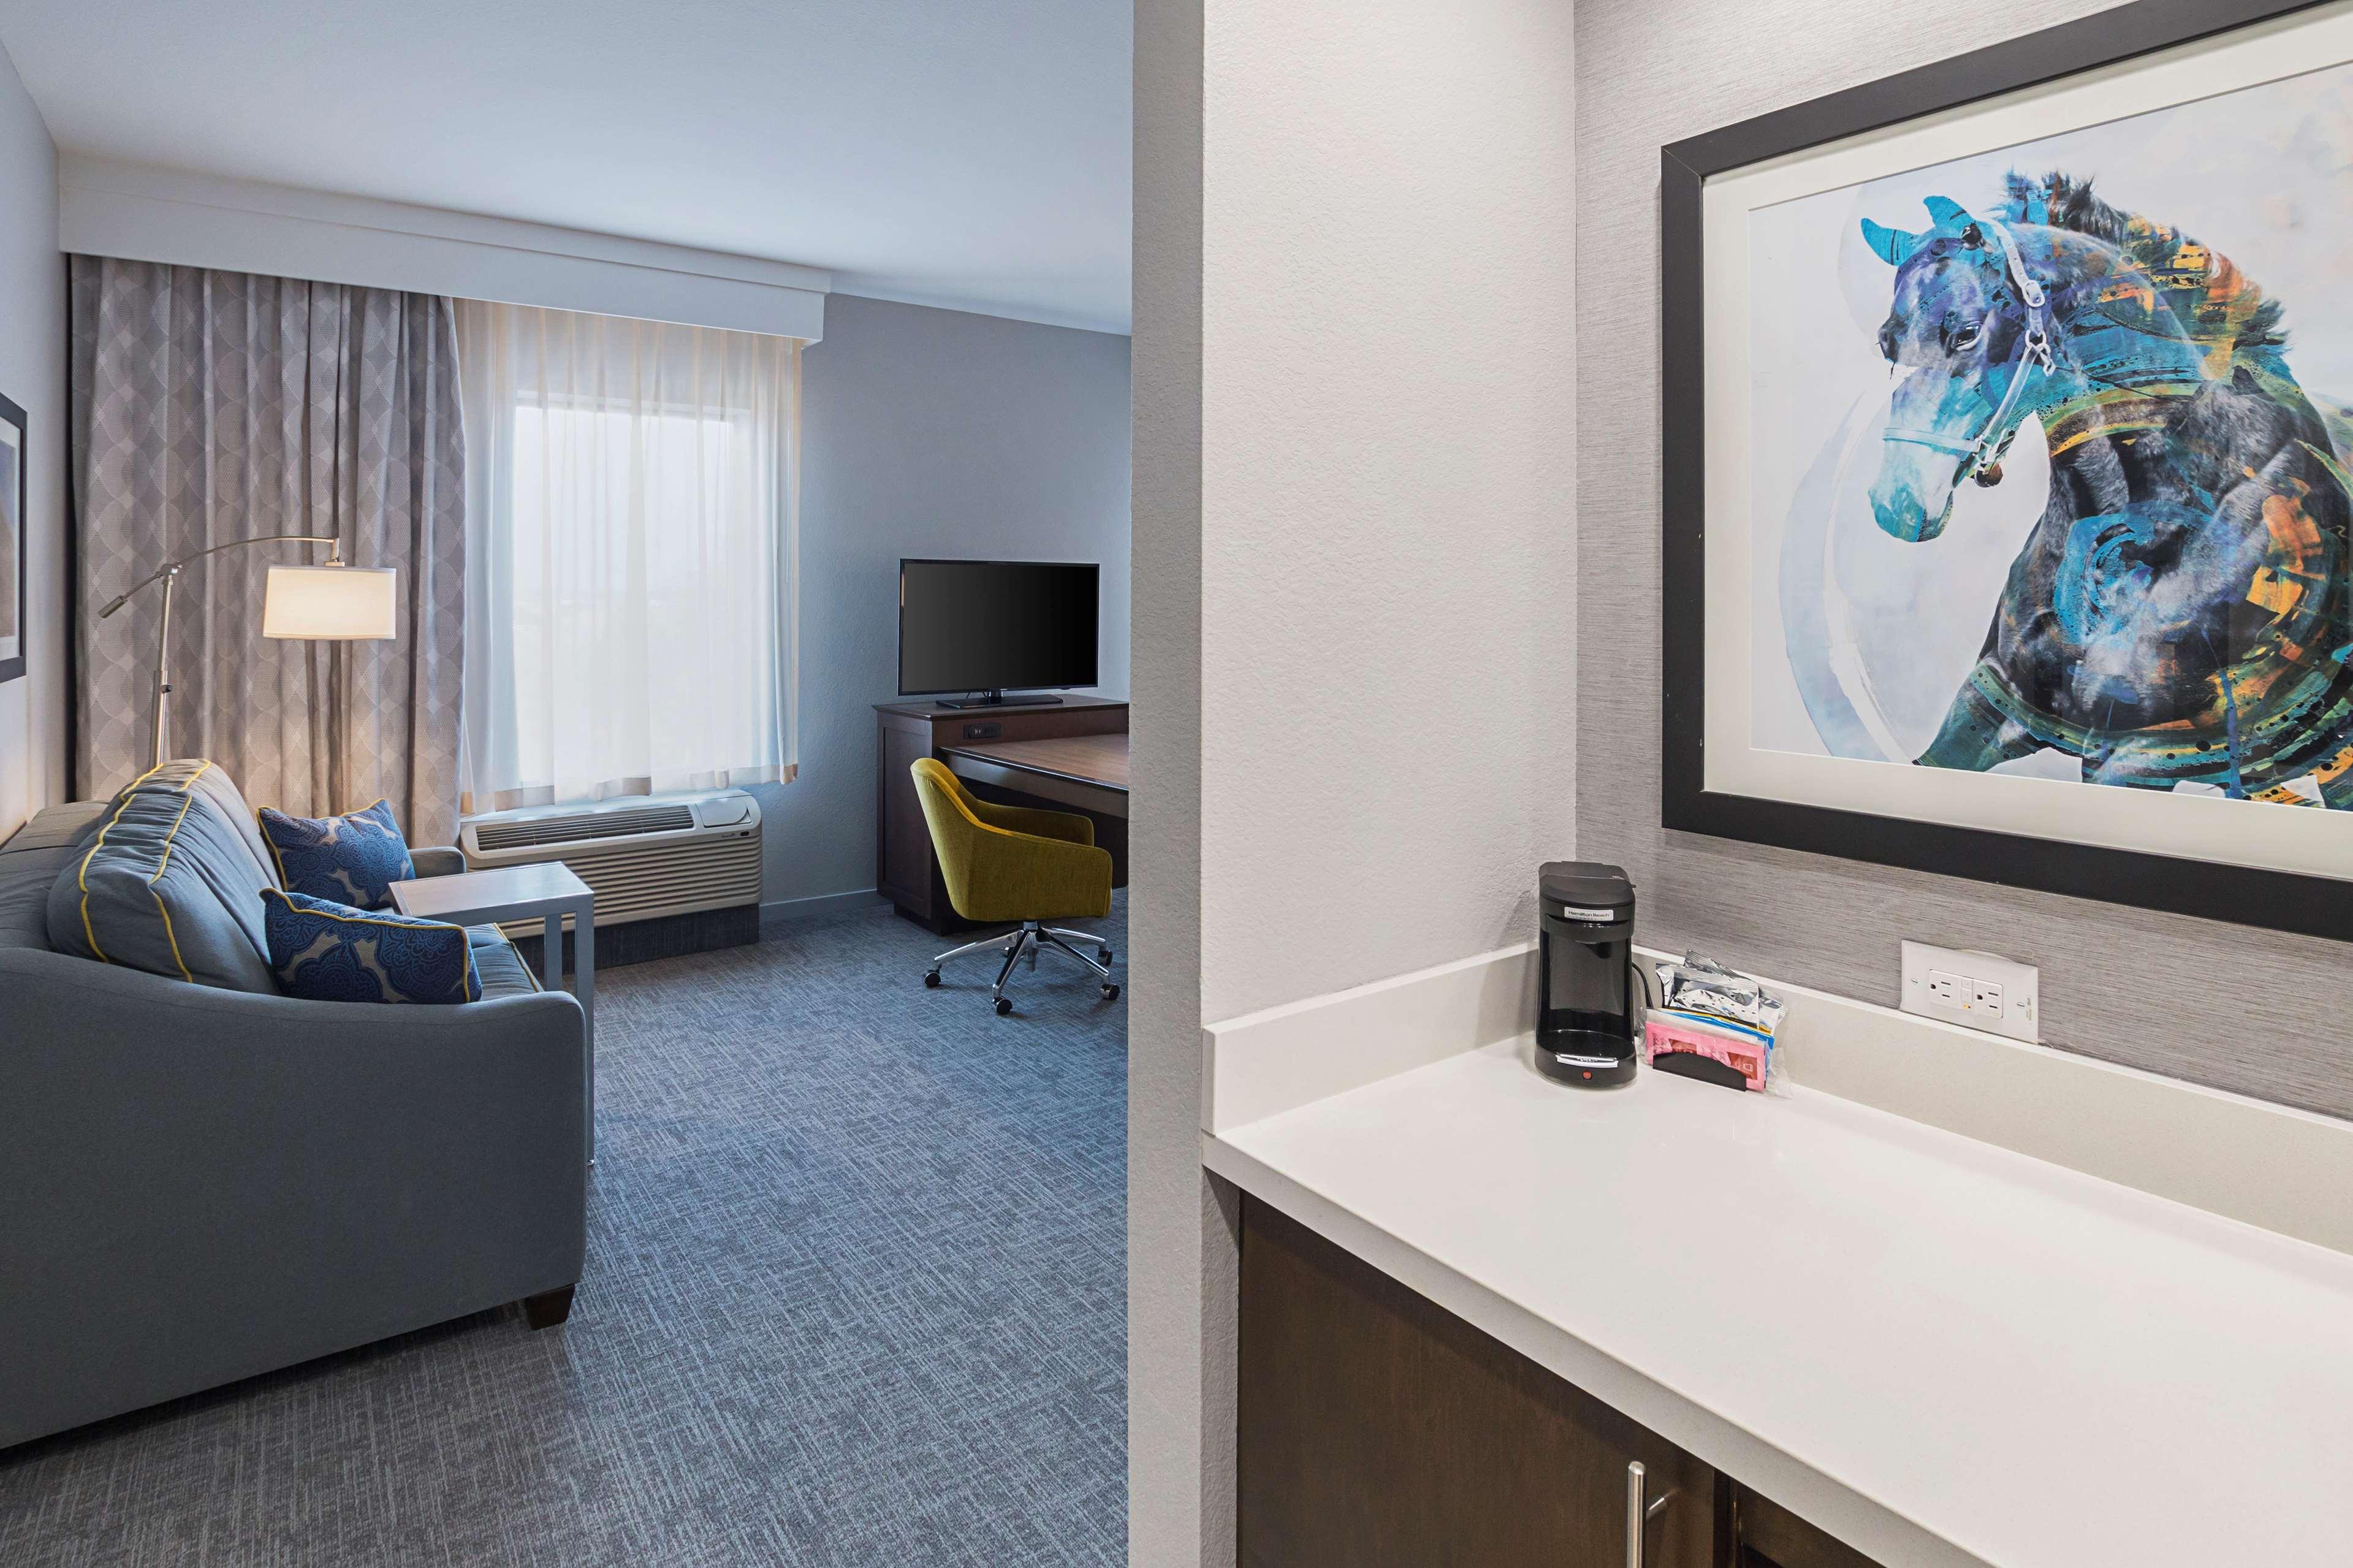 Hampton Inn & Suites Colleyville DFW West image 31